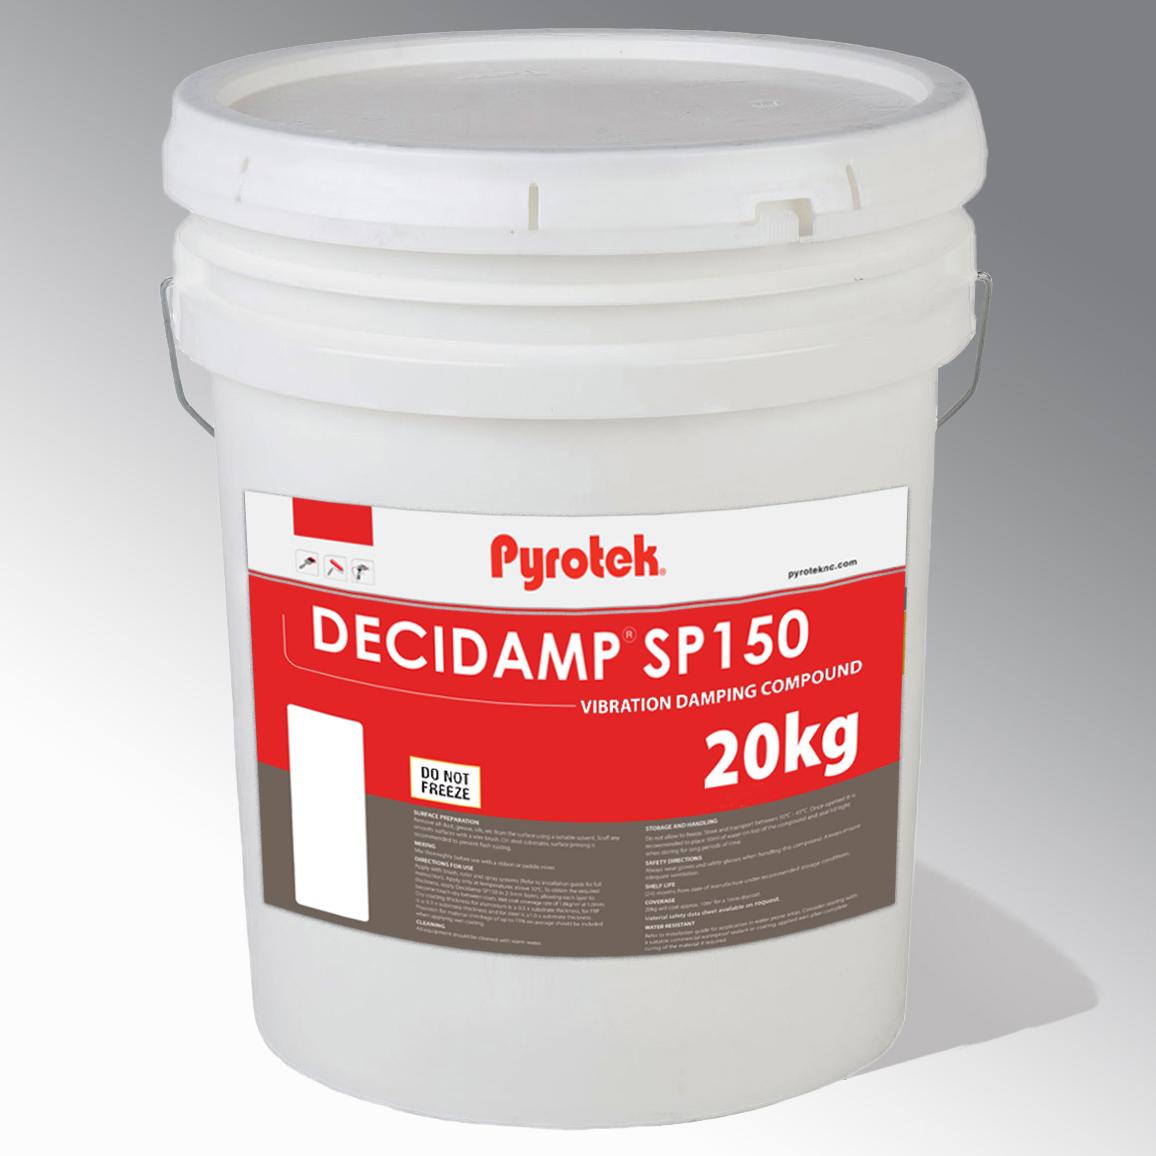 Decidamp SP 150